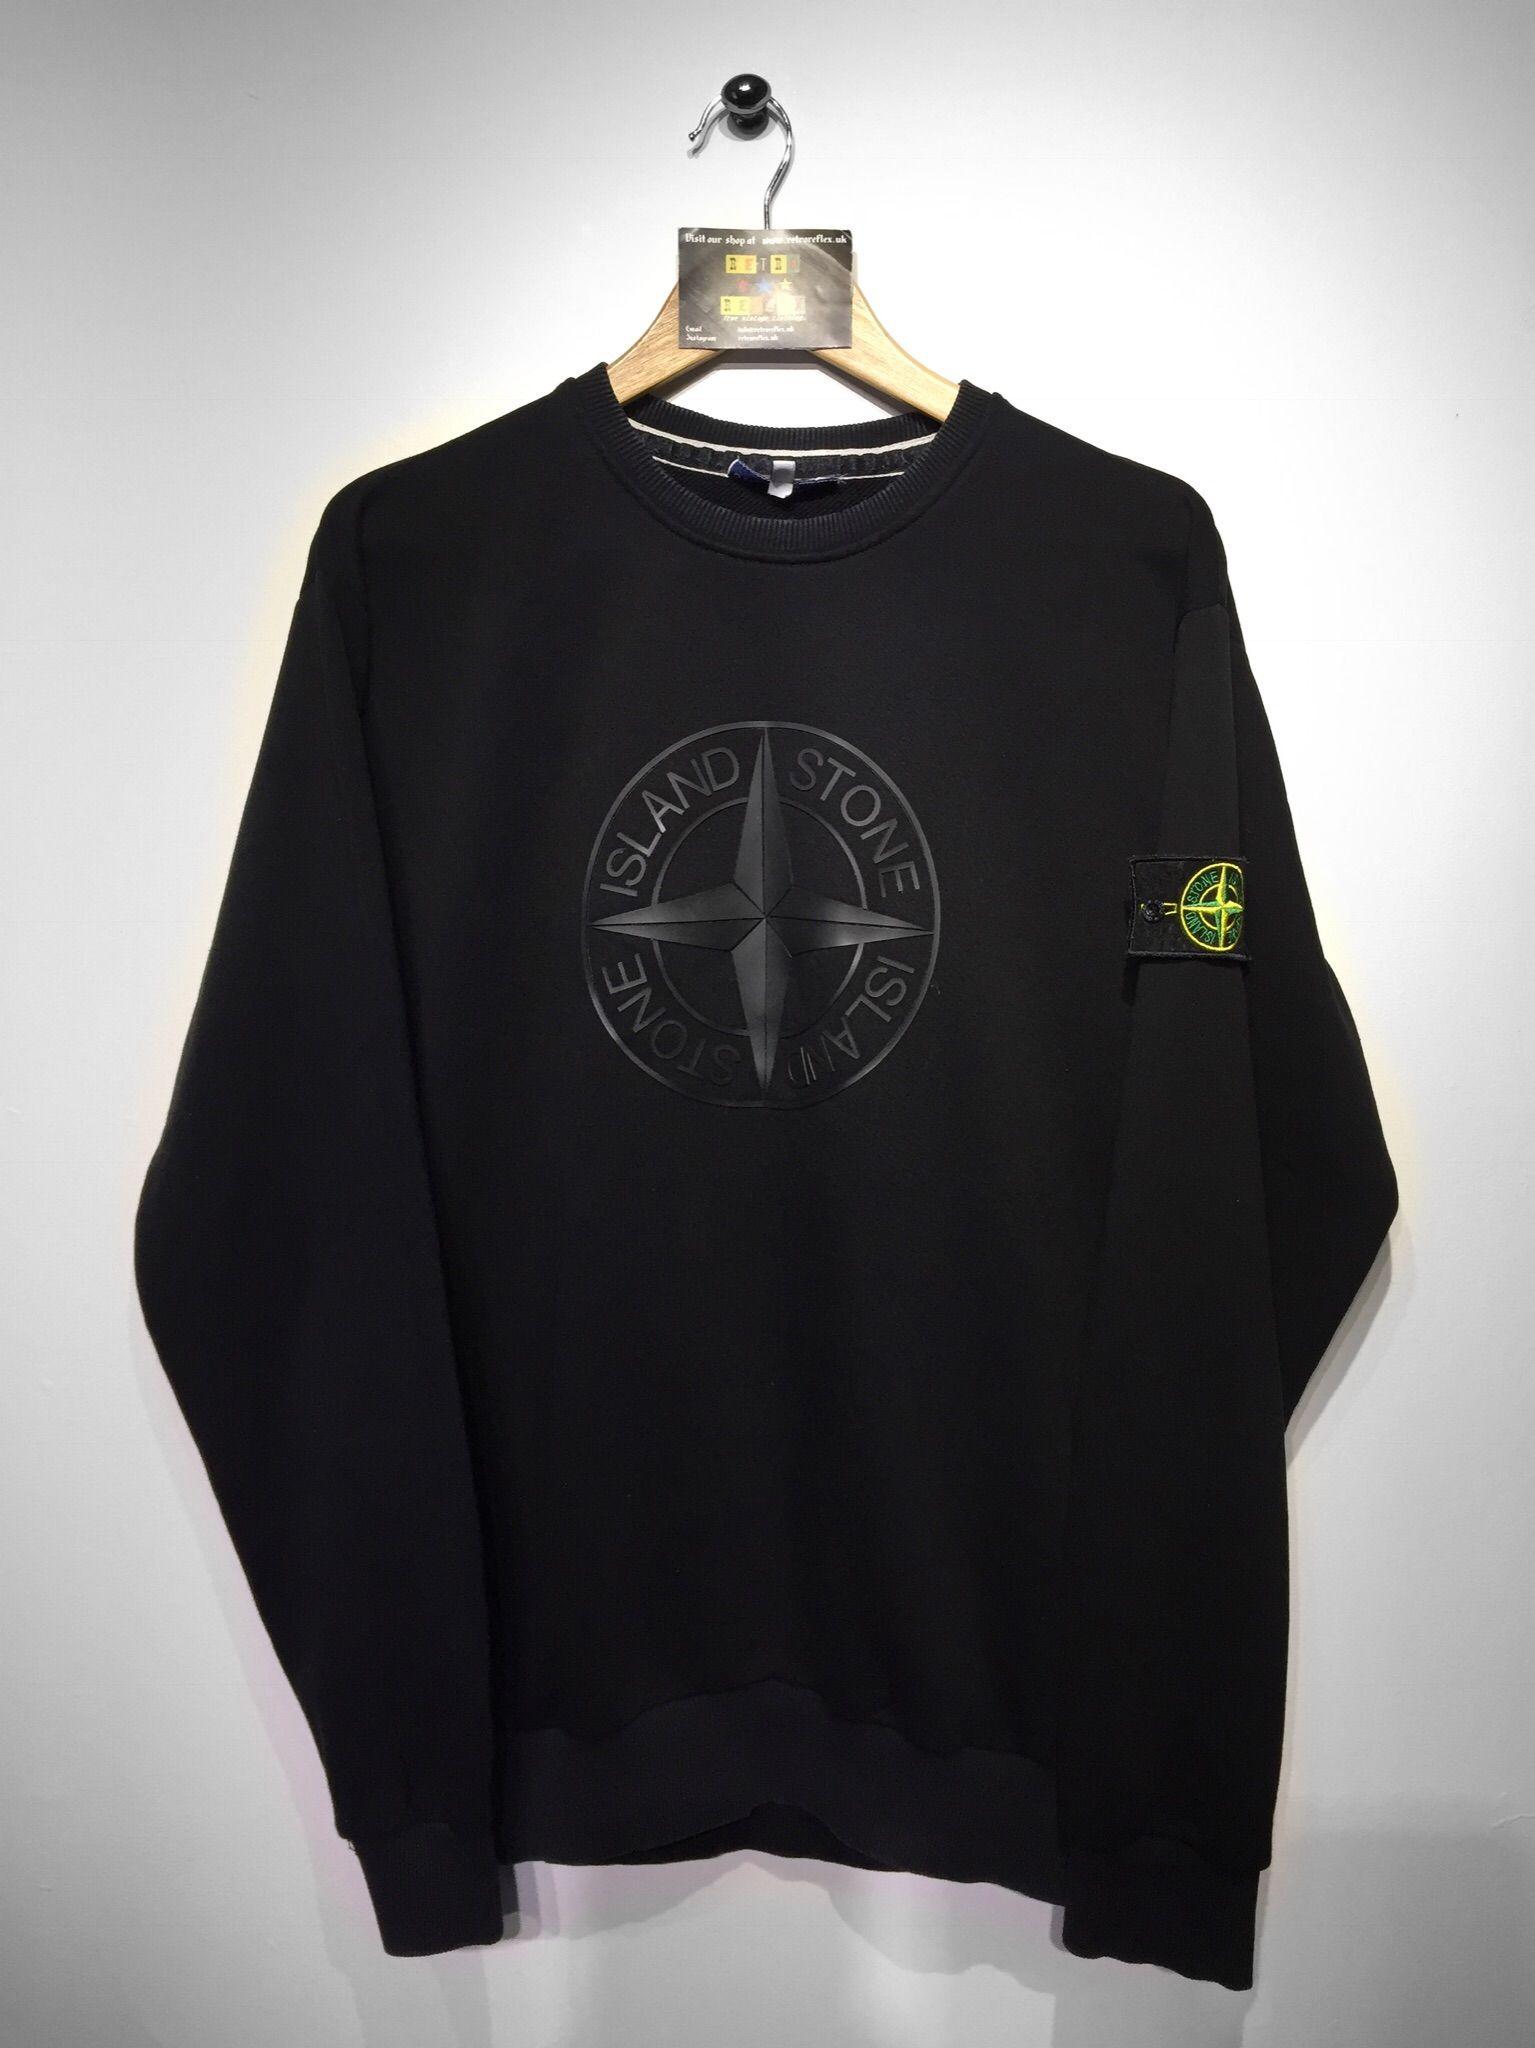 Stone Island Sweatshirt Size X Large But Fits Oversized 160 Website Www Retroreflex Uk Stoneisland Vint Stone Island Sweatshirt Clothes Design Clothes